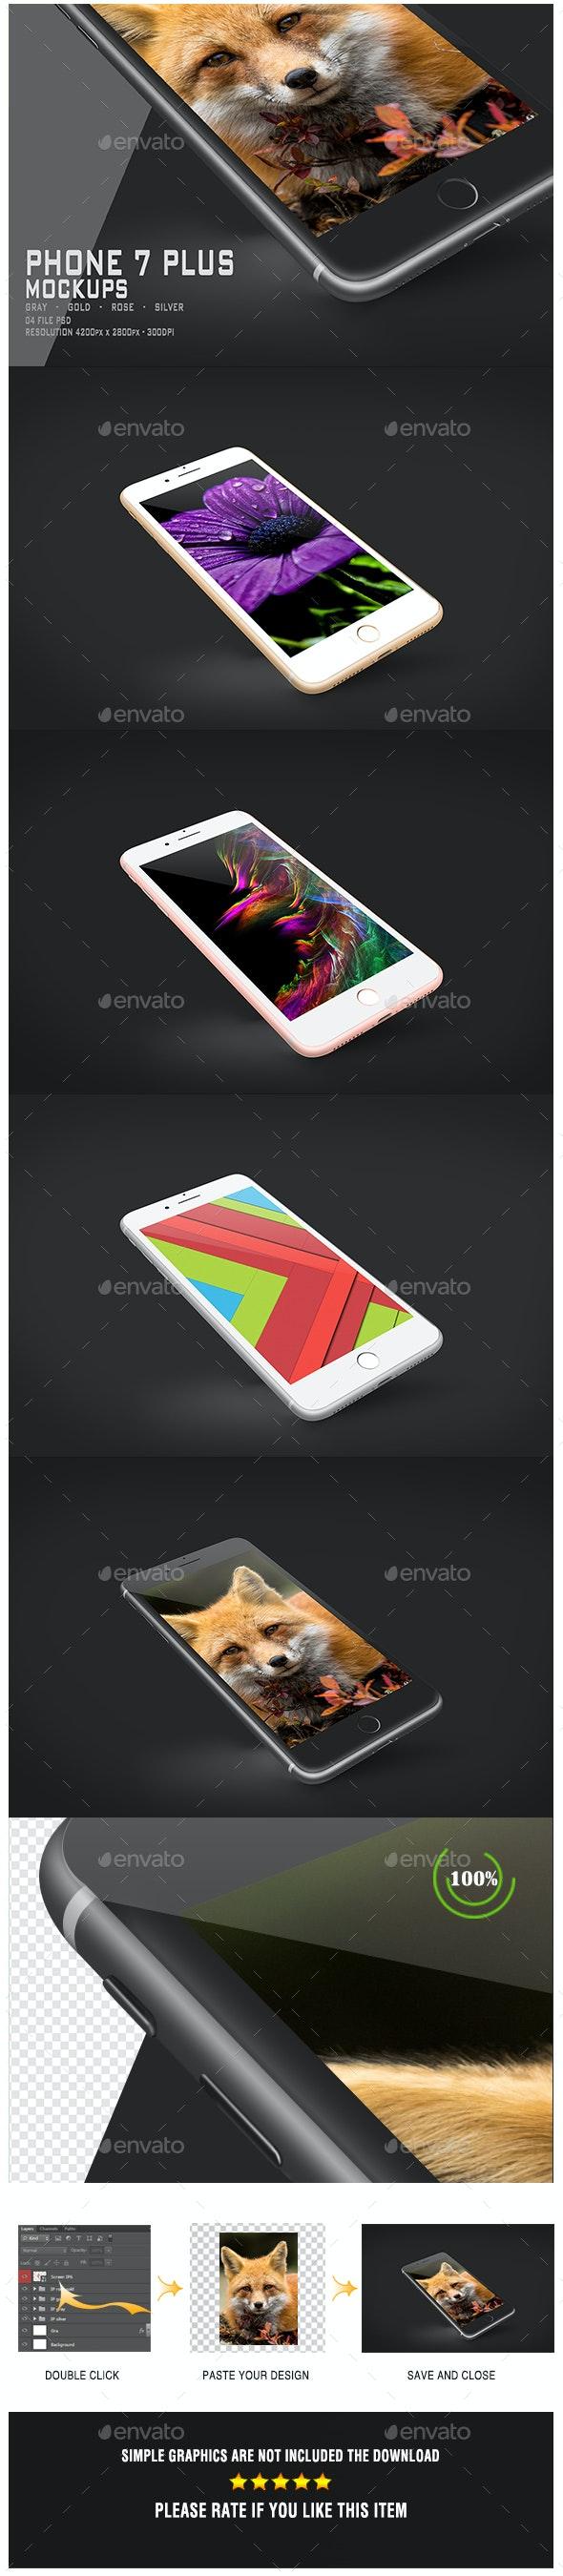 Phone 7 Plus Mockup - Mobile Displays